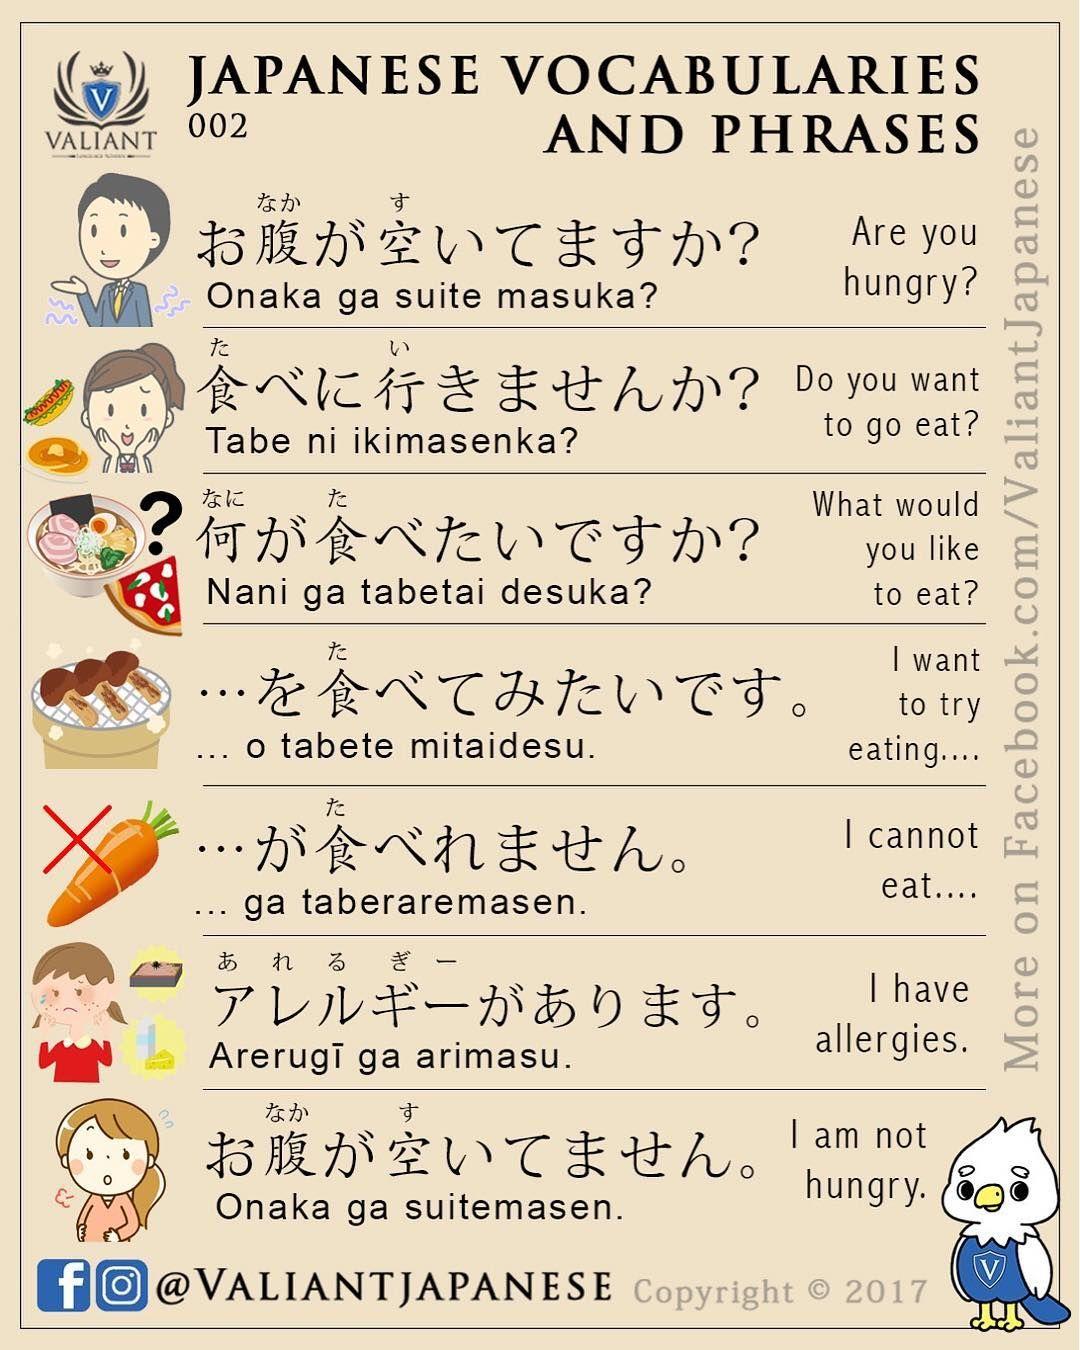 Valiant Language School Valiantjapanese On Instagram Japanese Vocabulary And Phrases 002